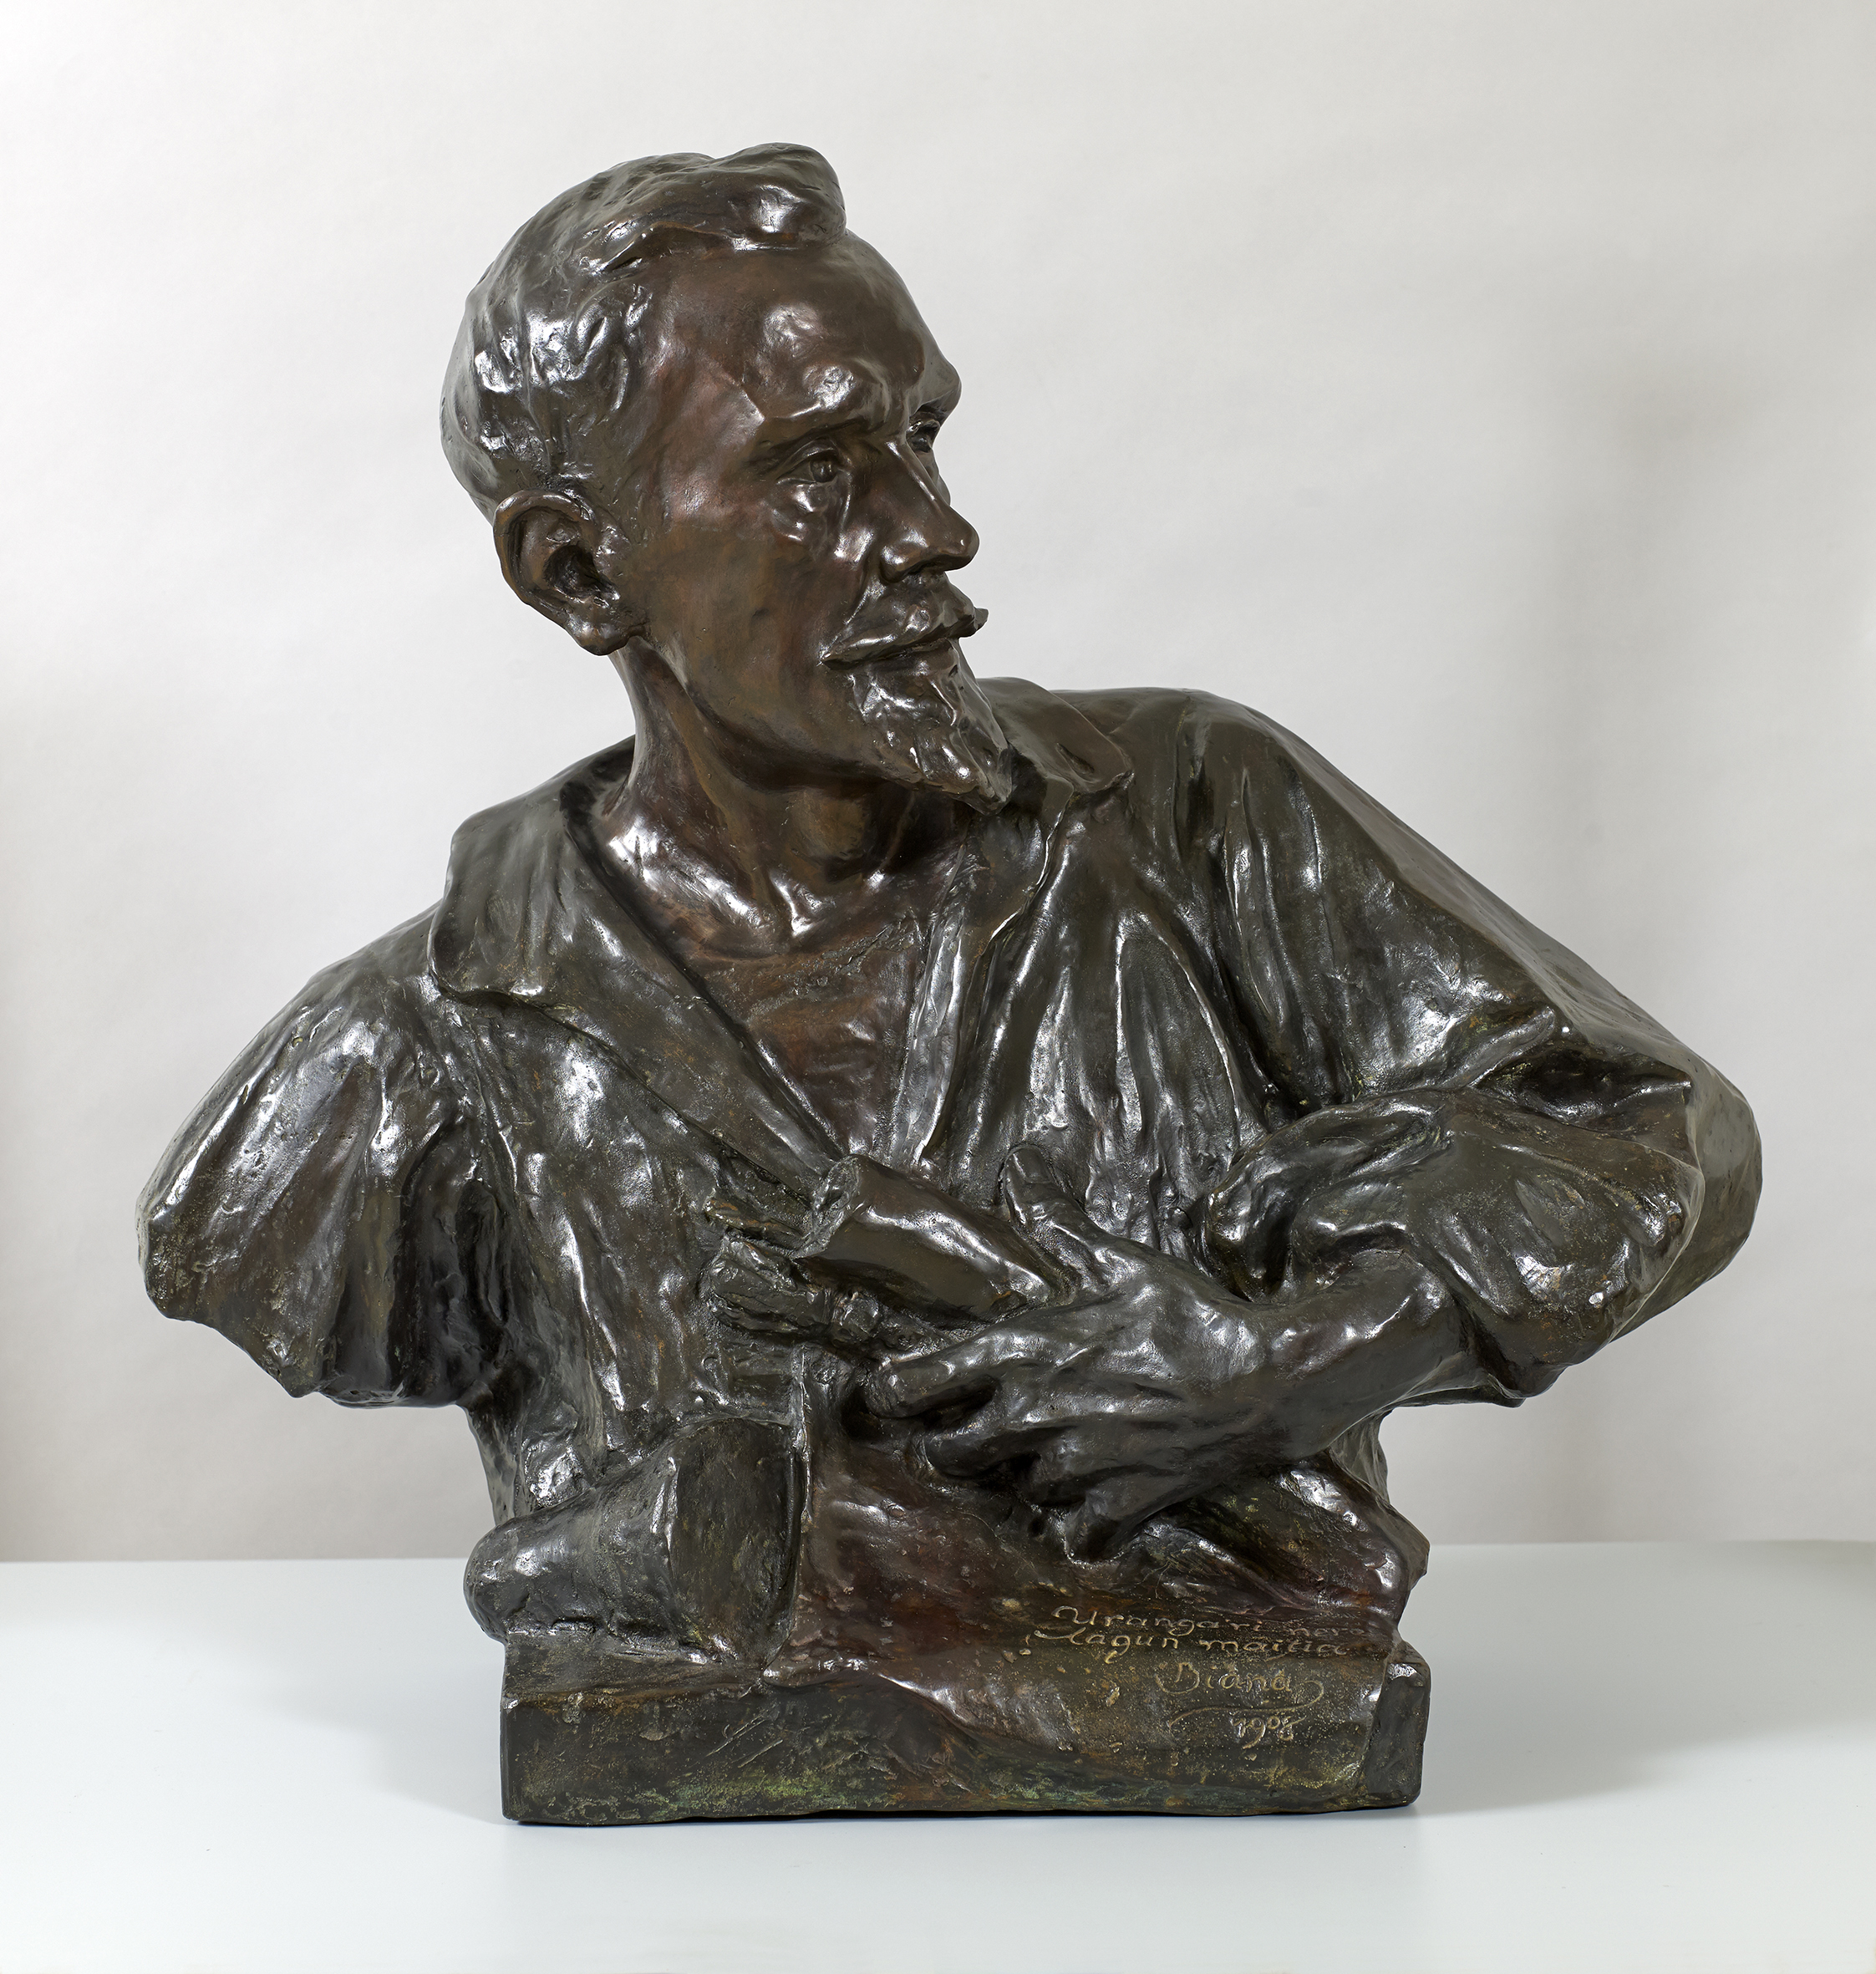 Pablo Urangaren bustoa